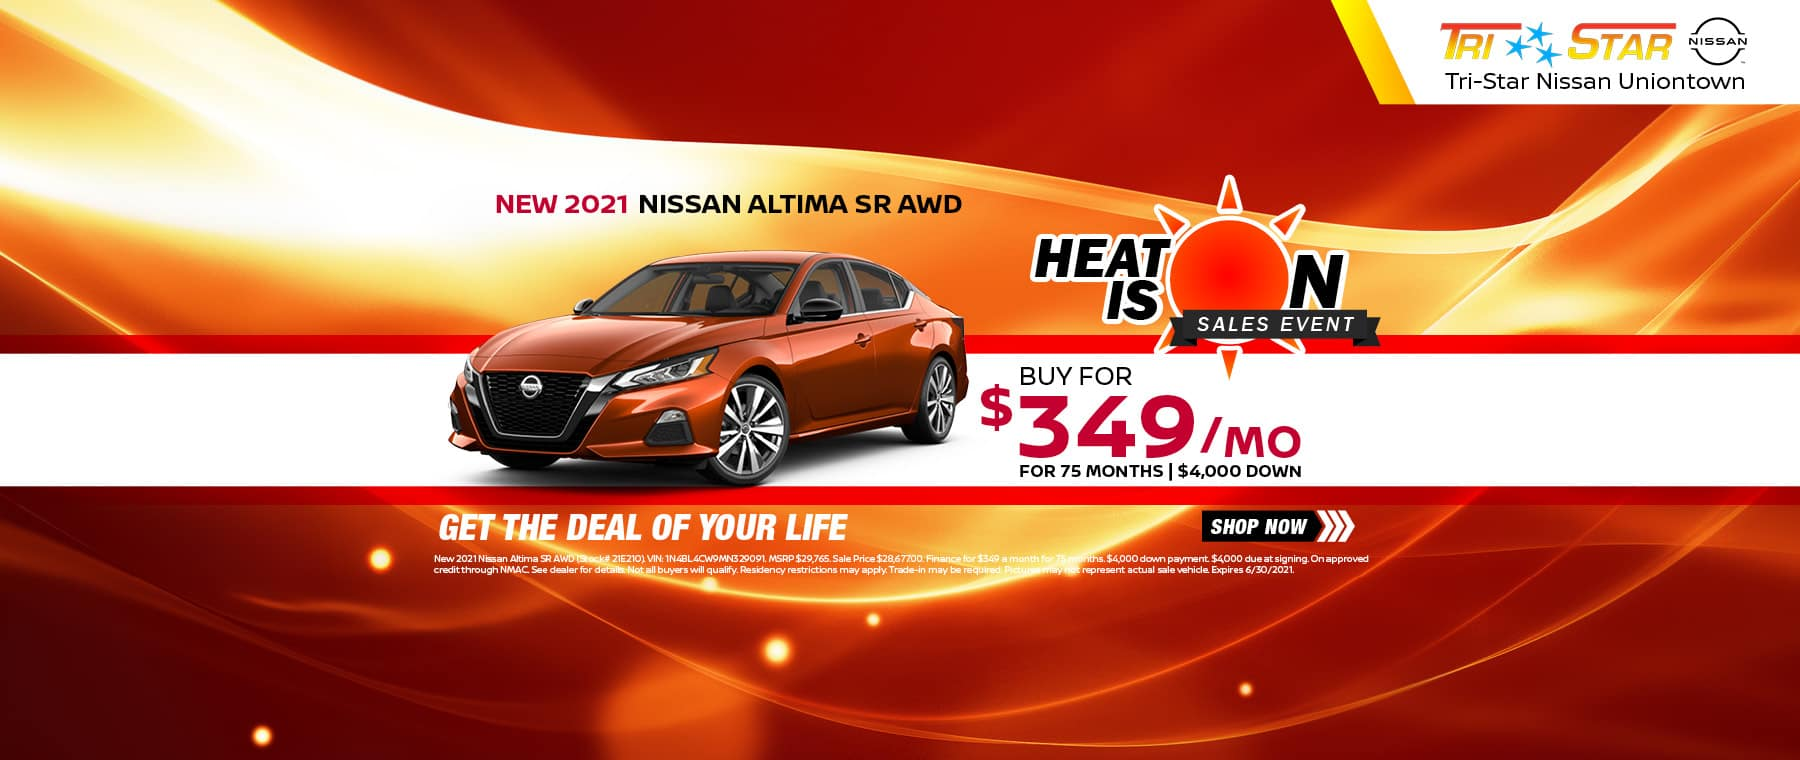 Heat is On Nissan Altima Banner